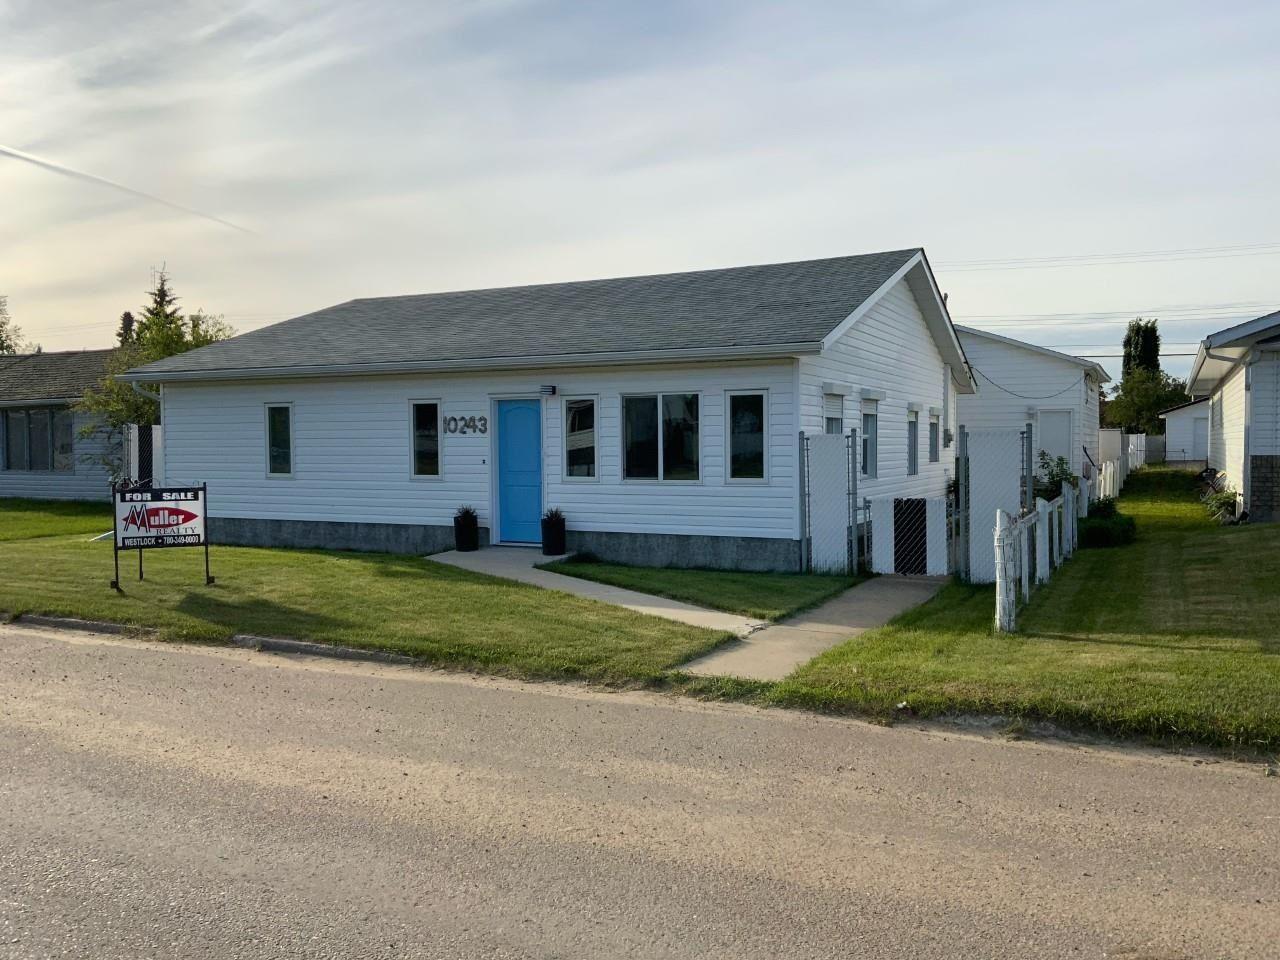 Main Photo: 10243 107 Street: Westlock House for sale : MLS®# E4248516